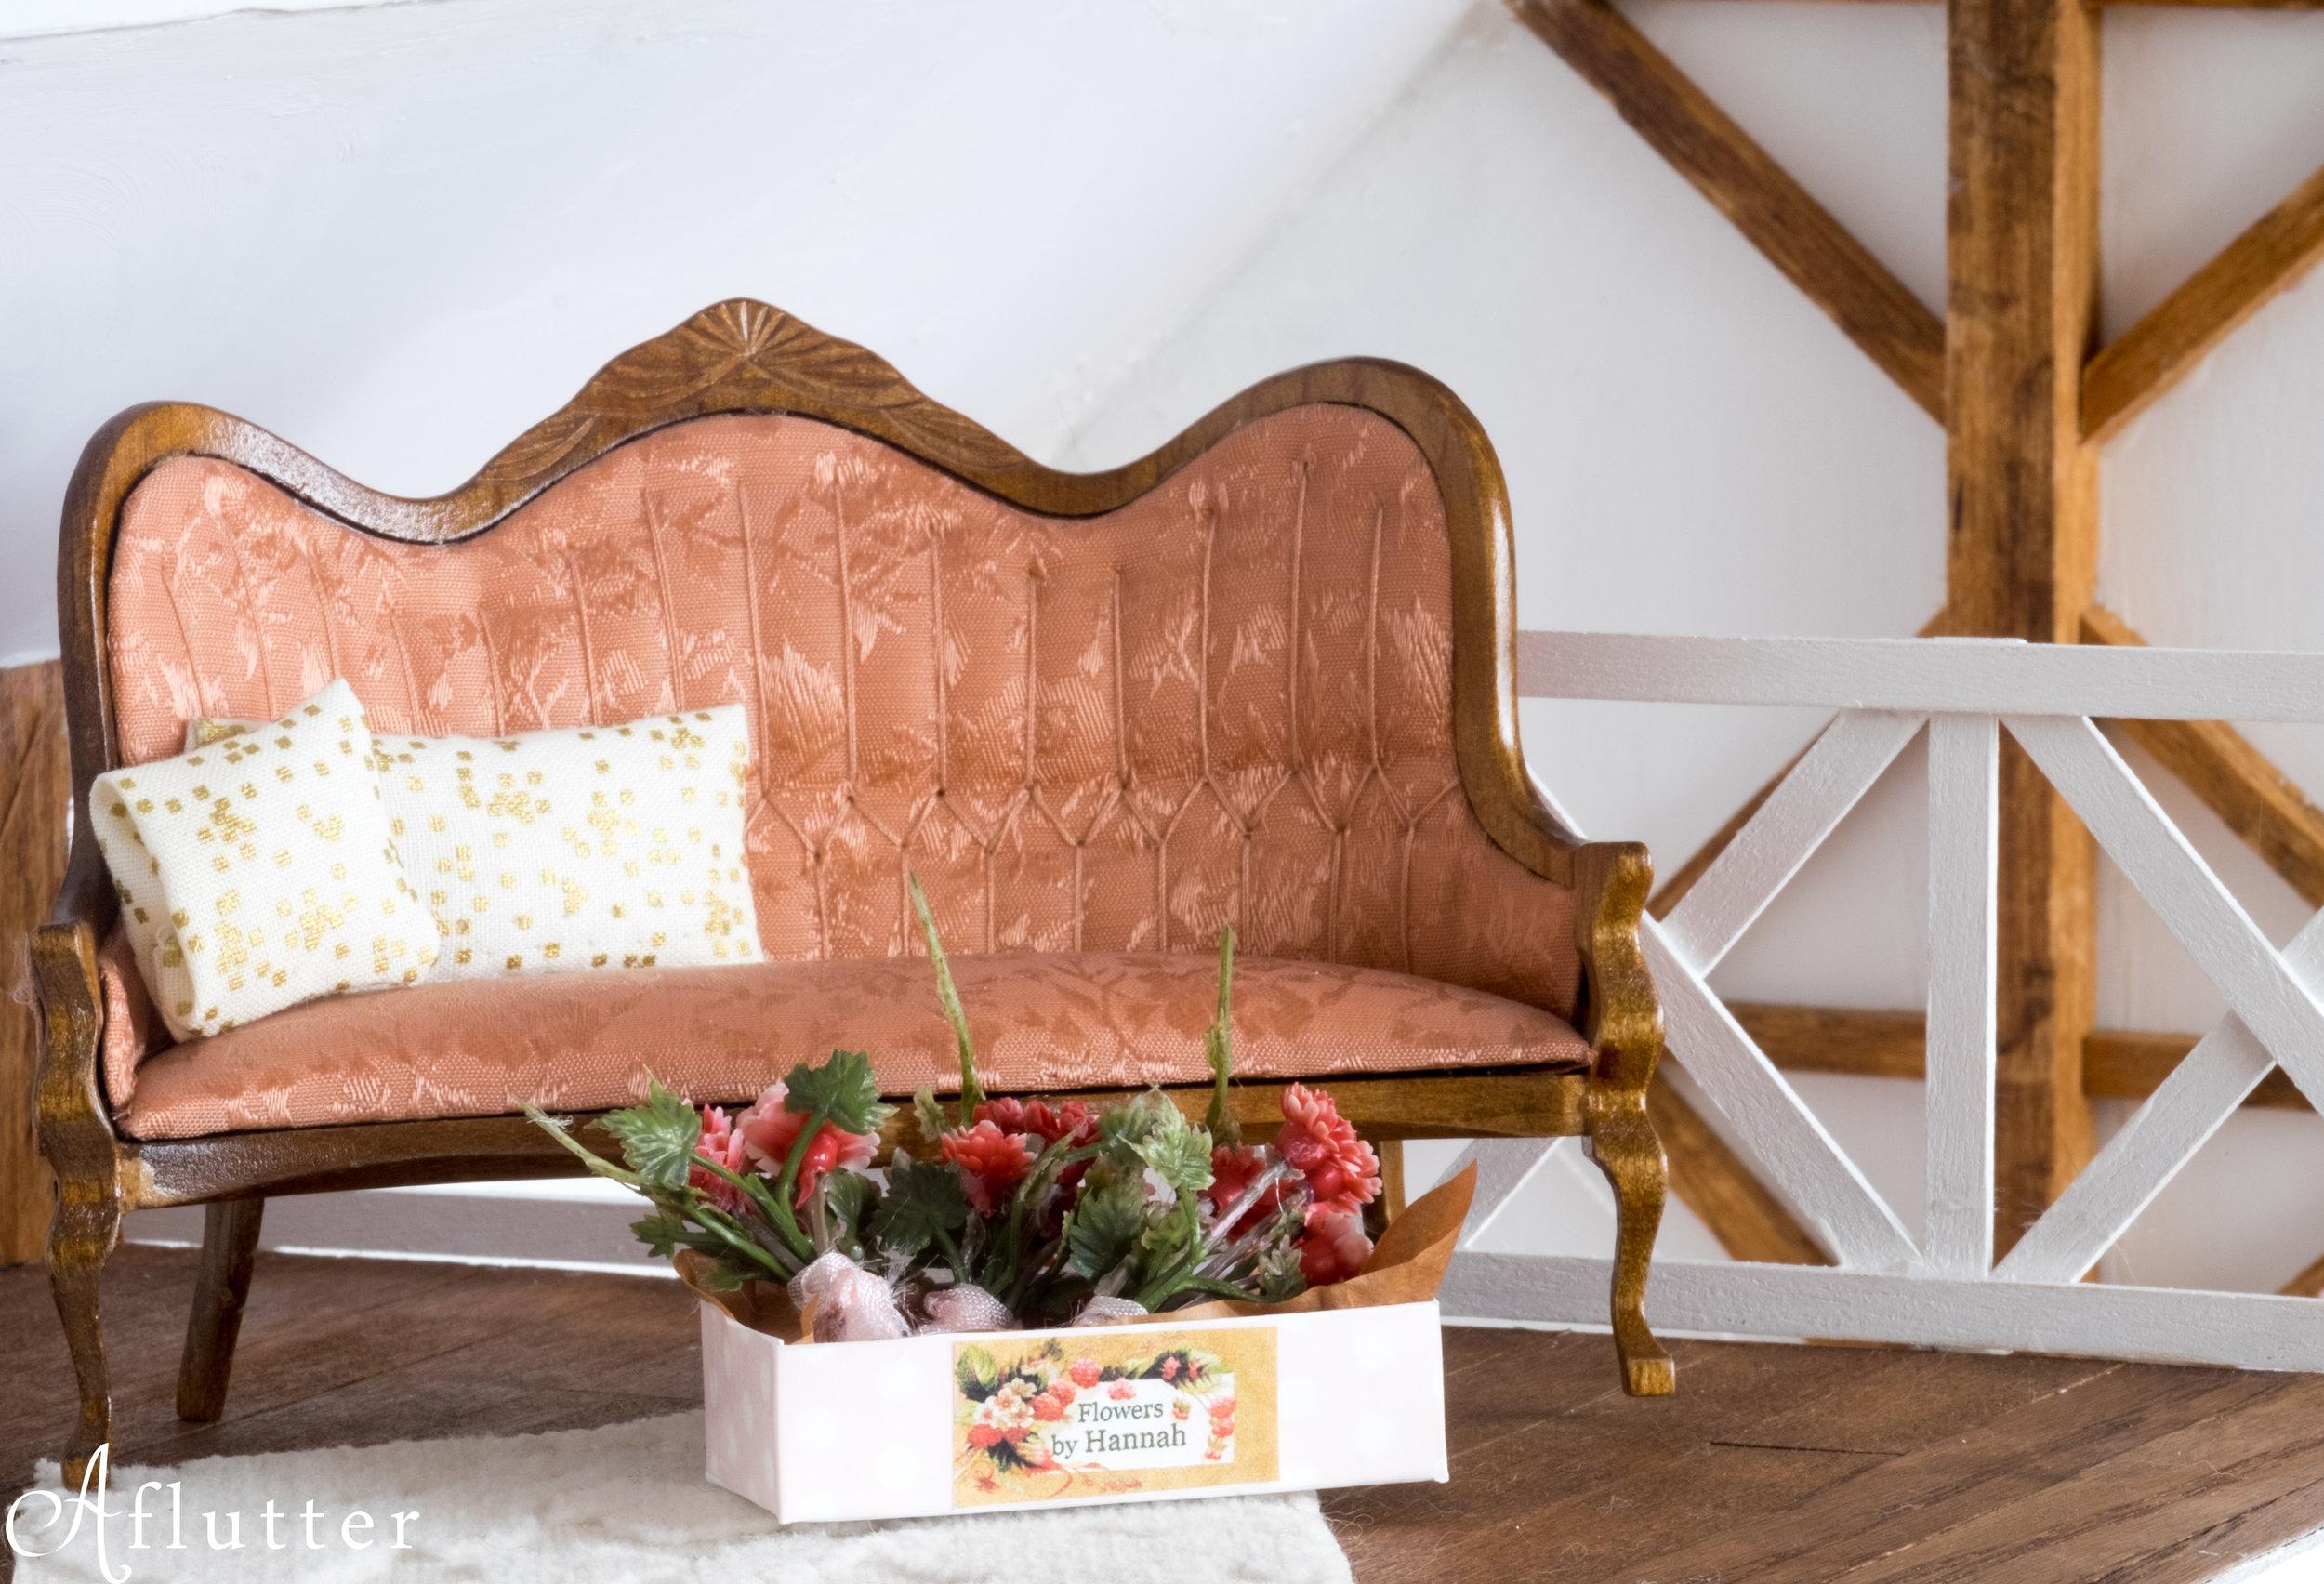 Brenul-Barn-Mini-Wedding-6-of-16.jpg